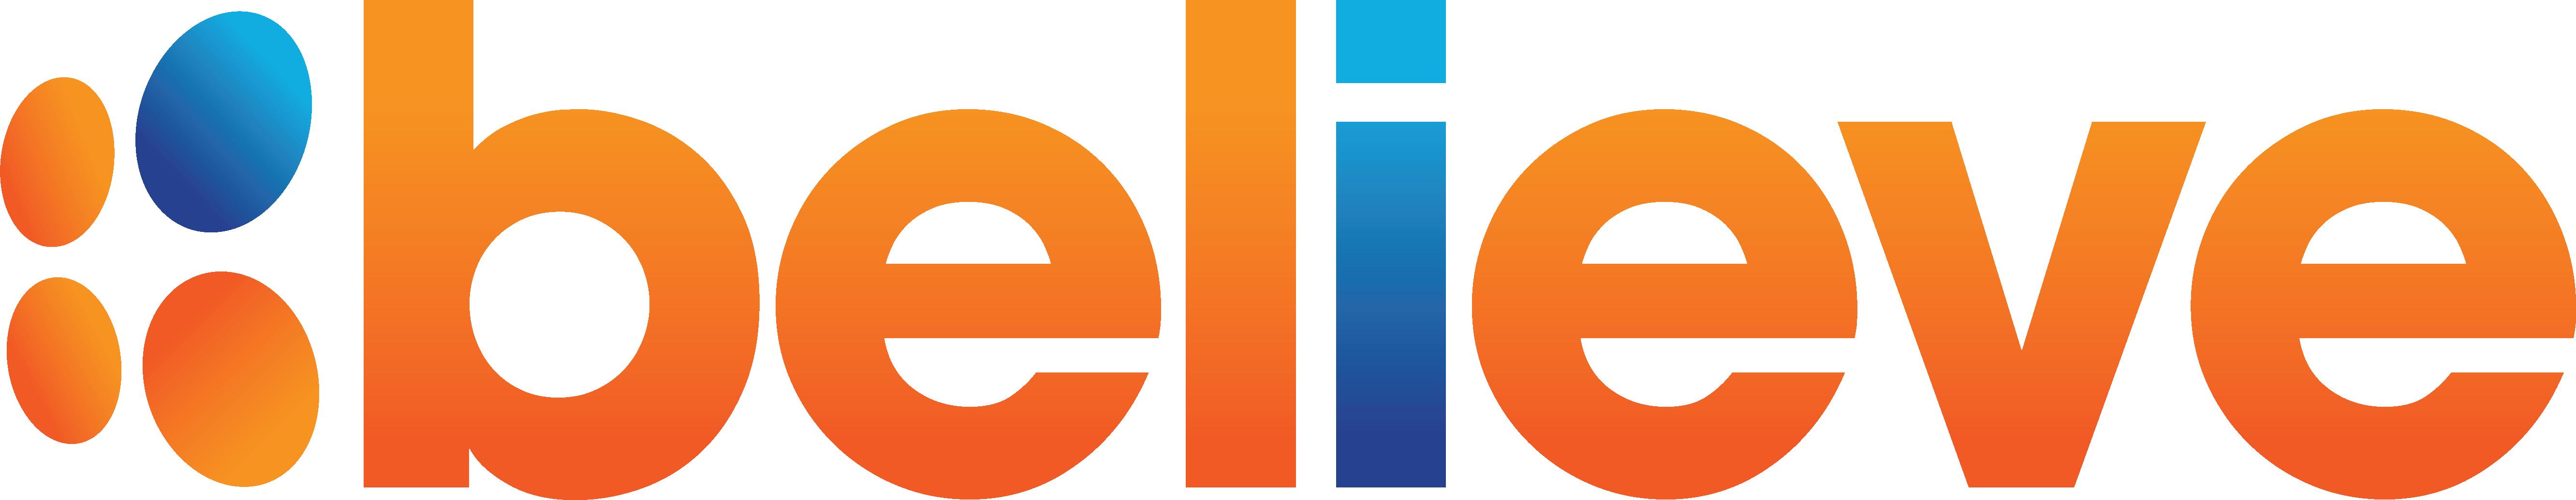 Ciy believe logo